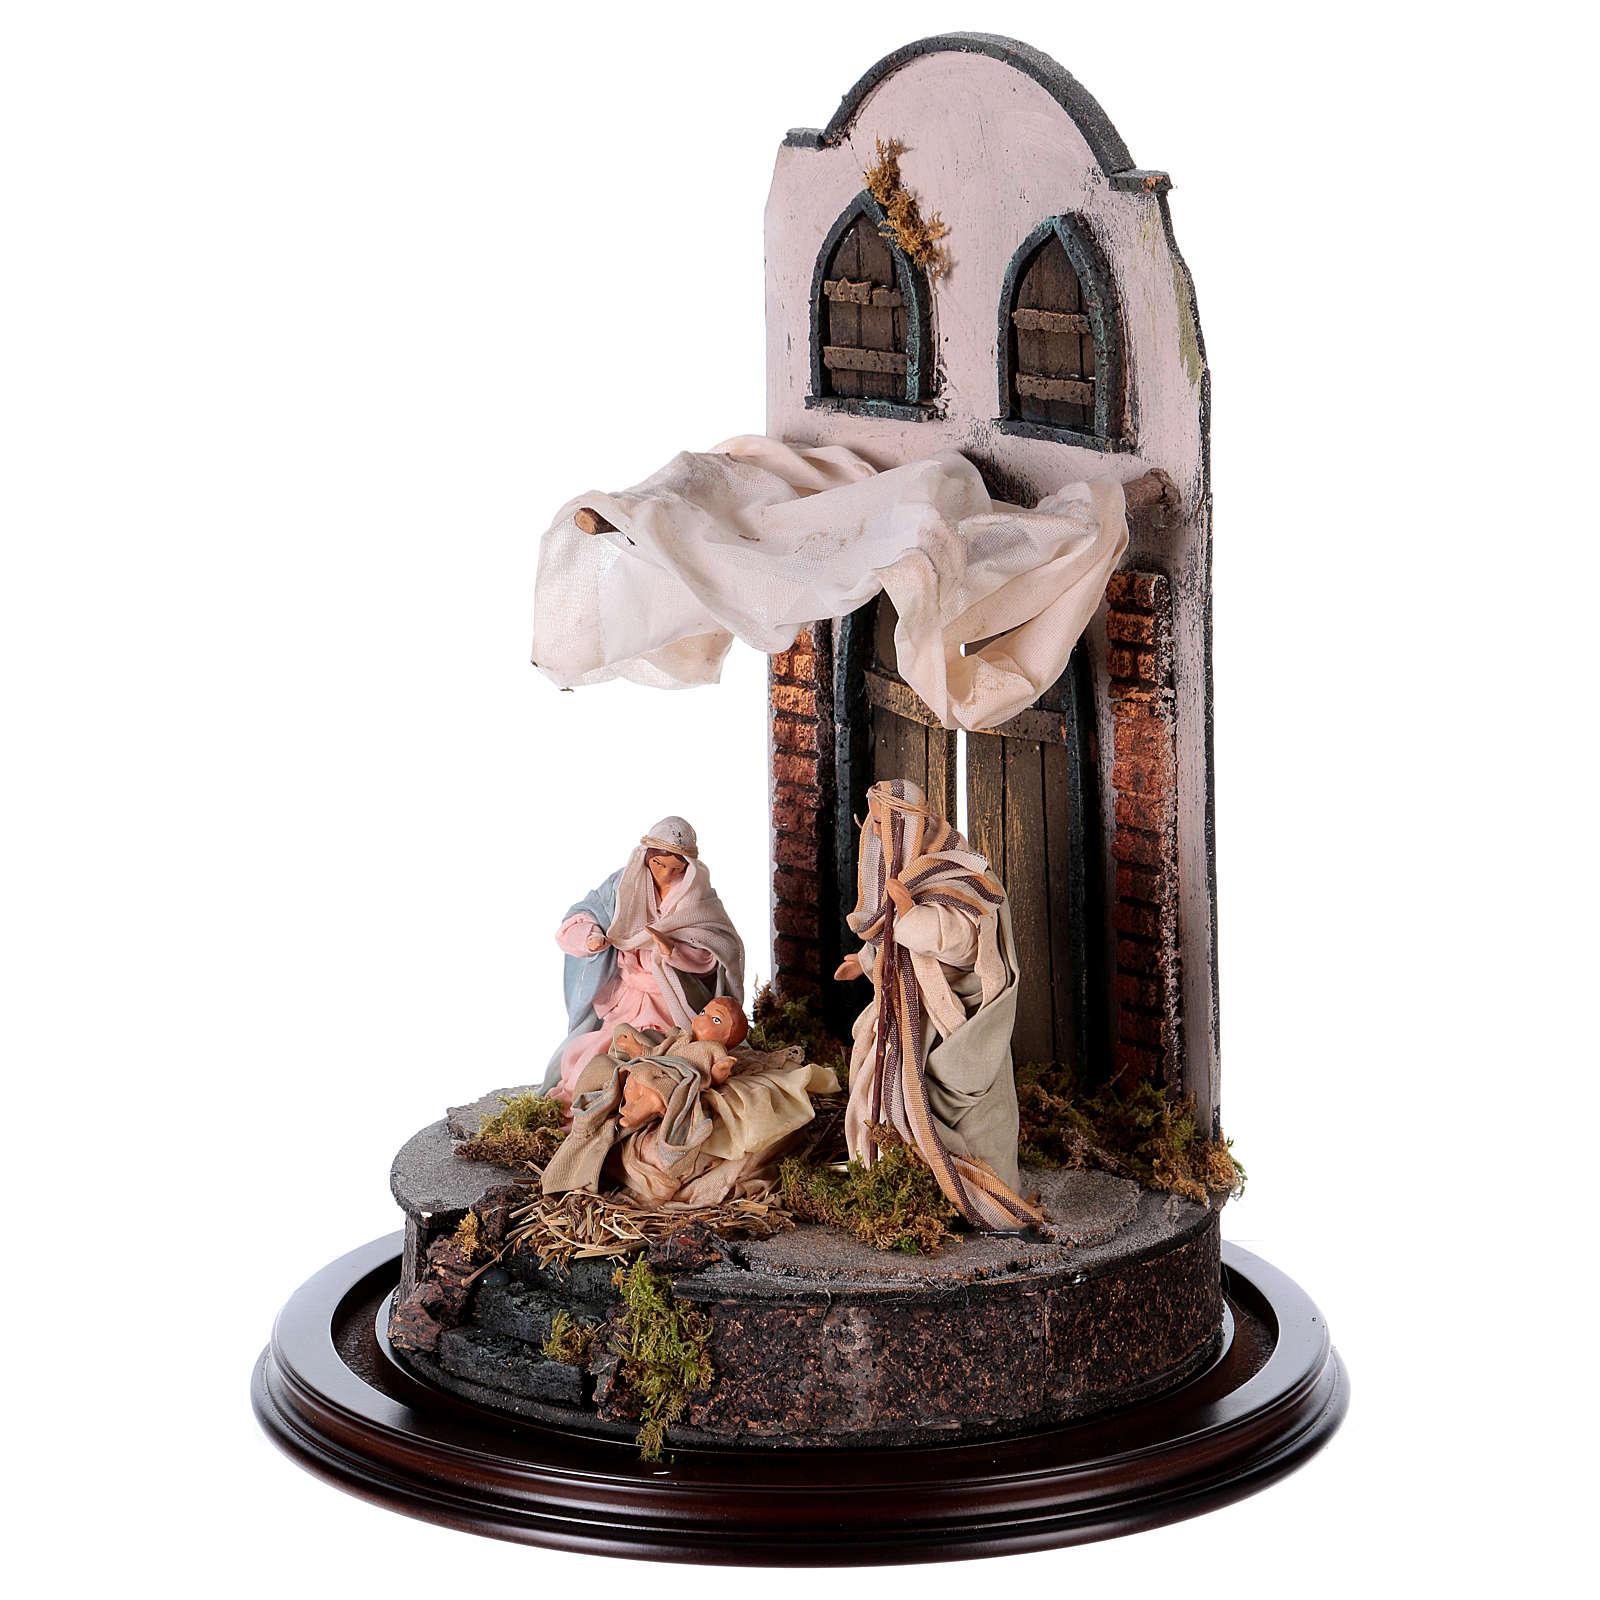 Neapolitan Nativity, Arabian style in glass dome 25x40cm 4